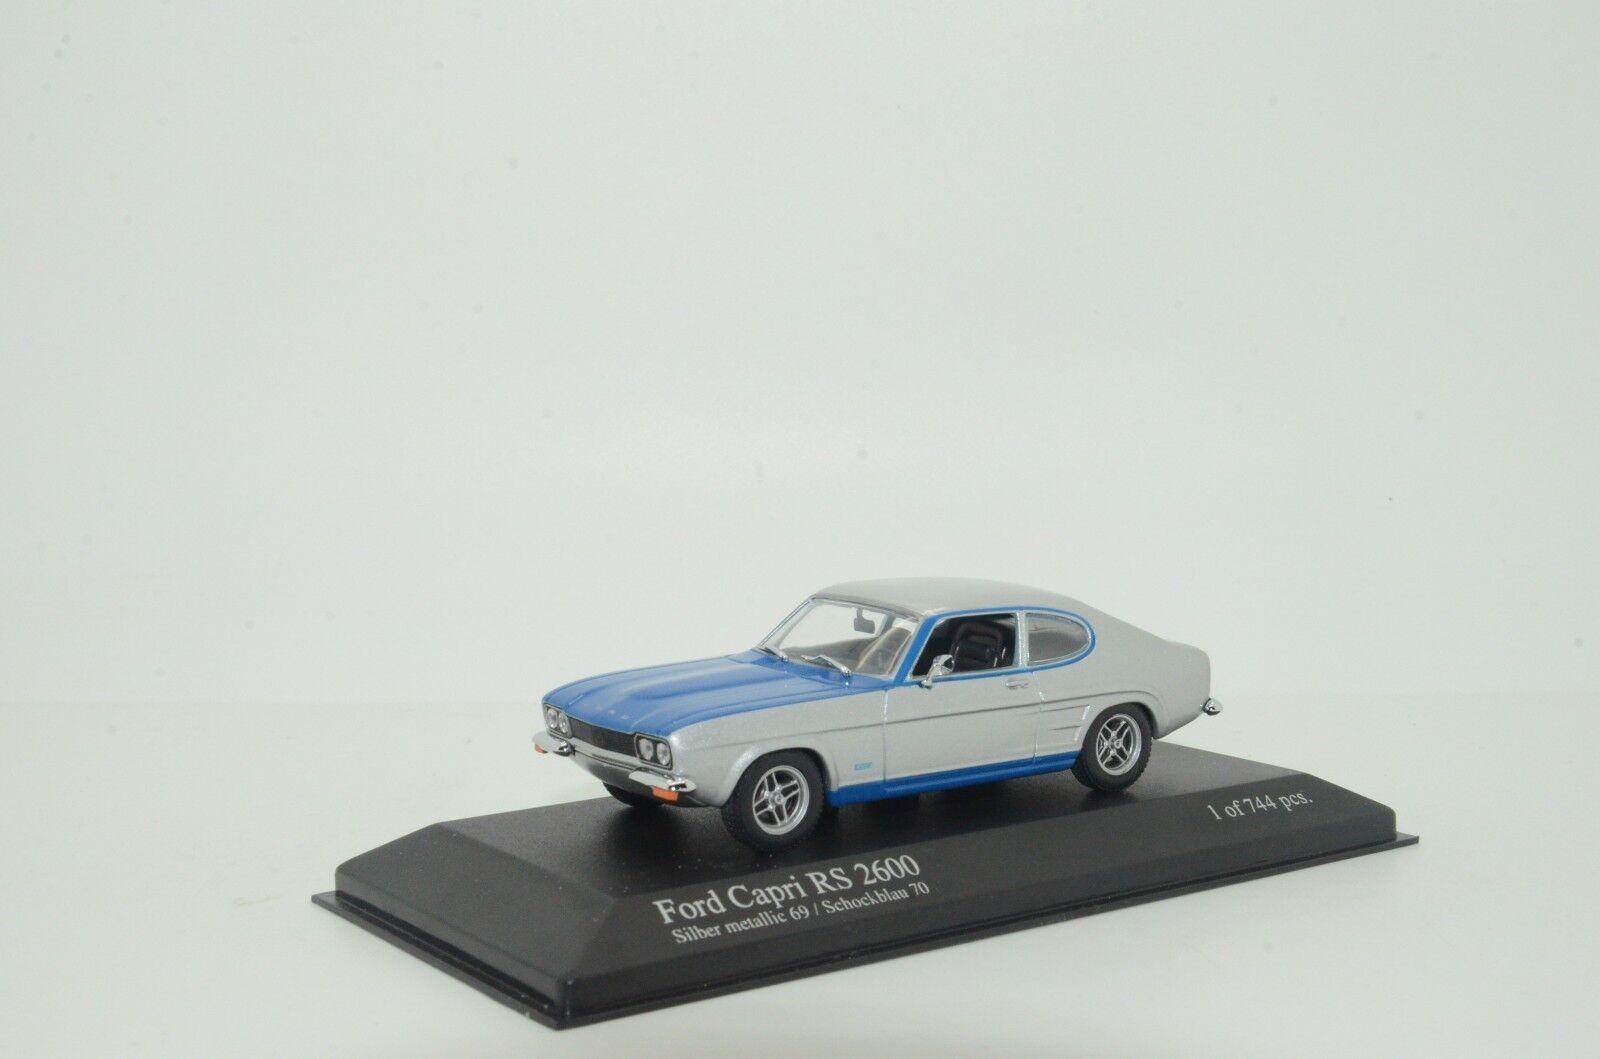 Rara Ford Capri RS 2600 1972 plata azul Minichamps 85805 1 43